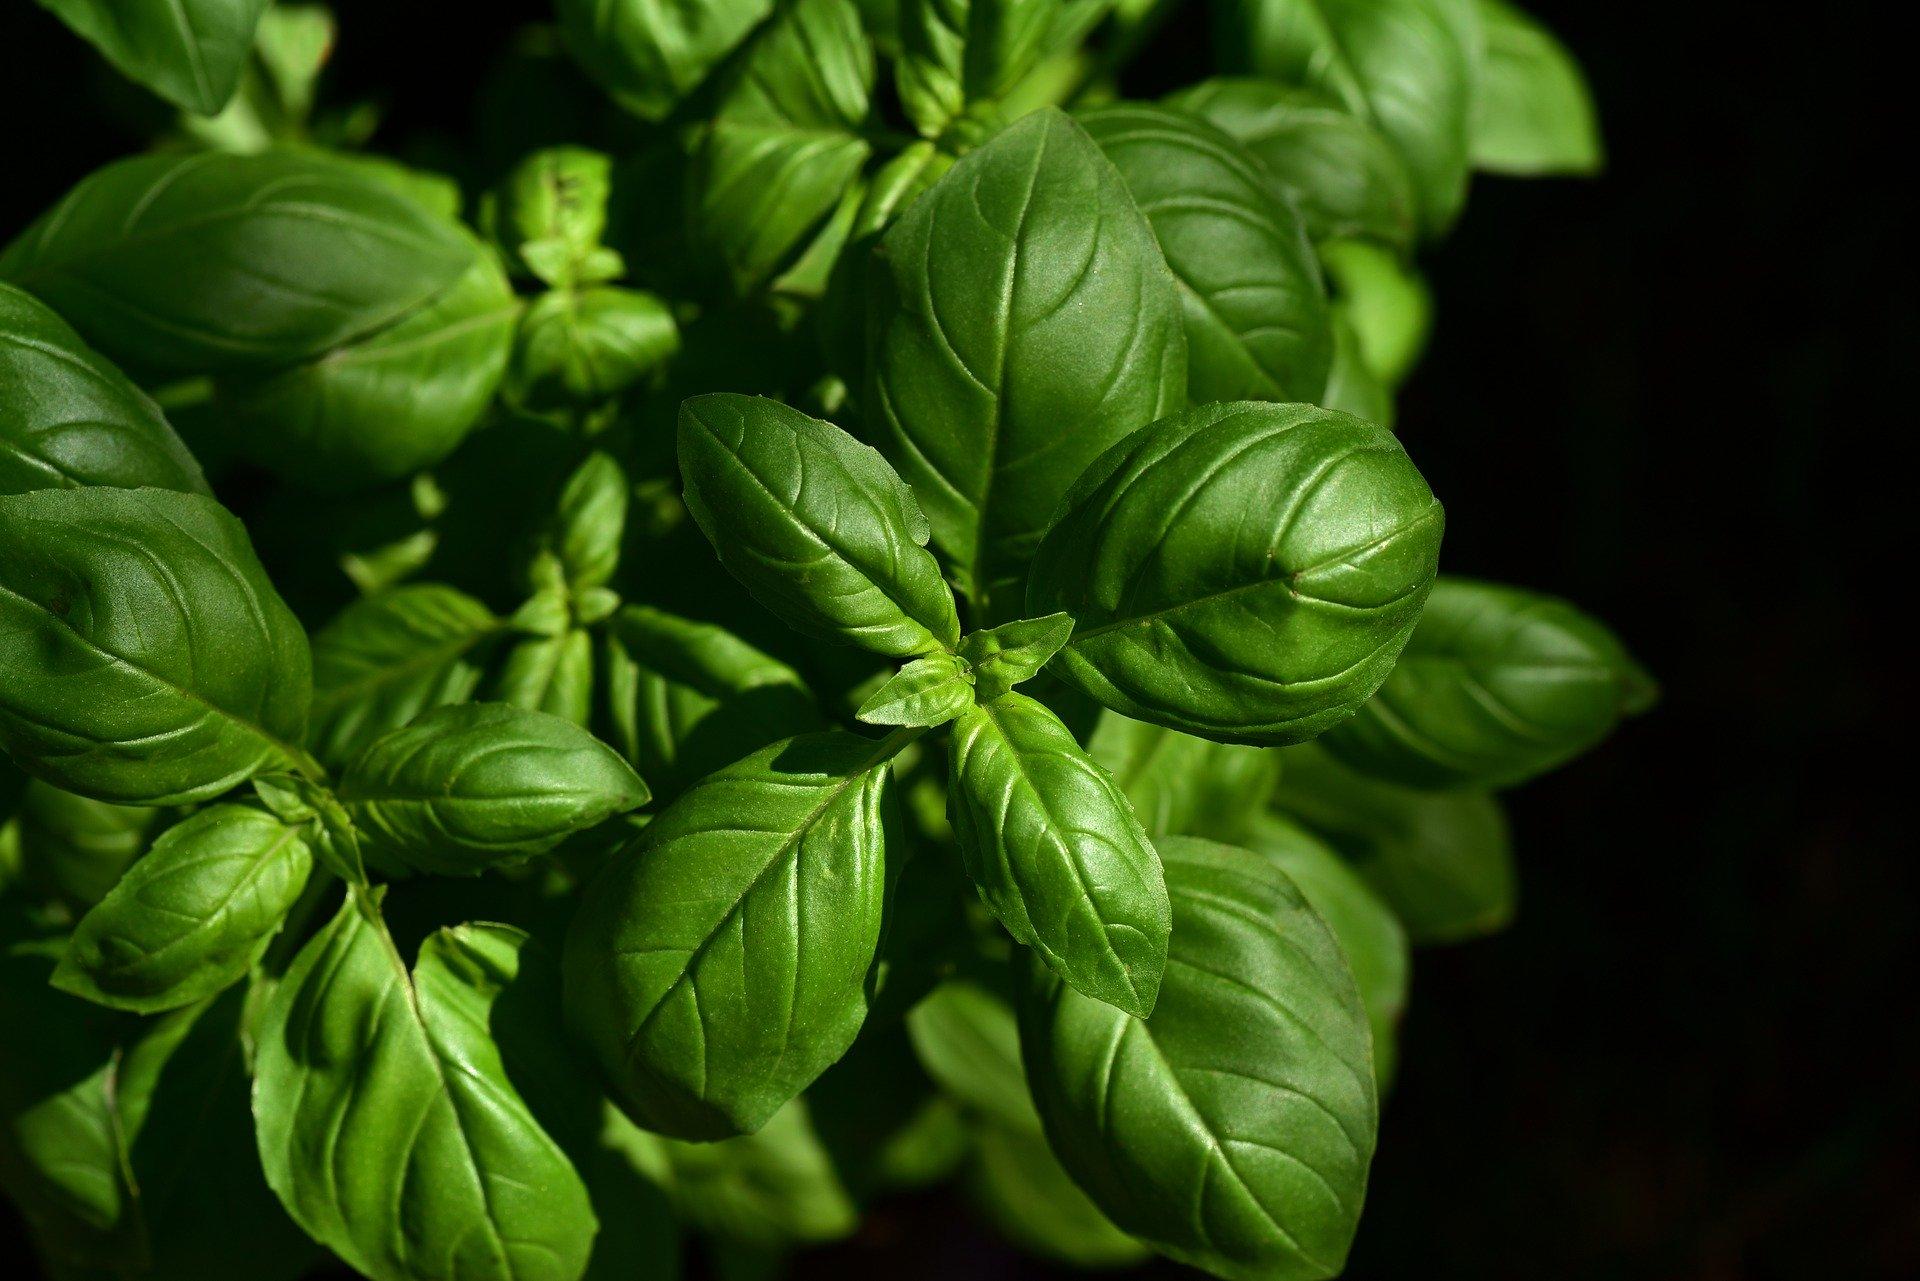 Wednesday april 29 - Walk: discover toxic/eatable/medicinal plants